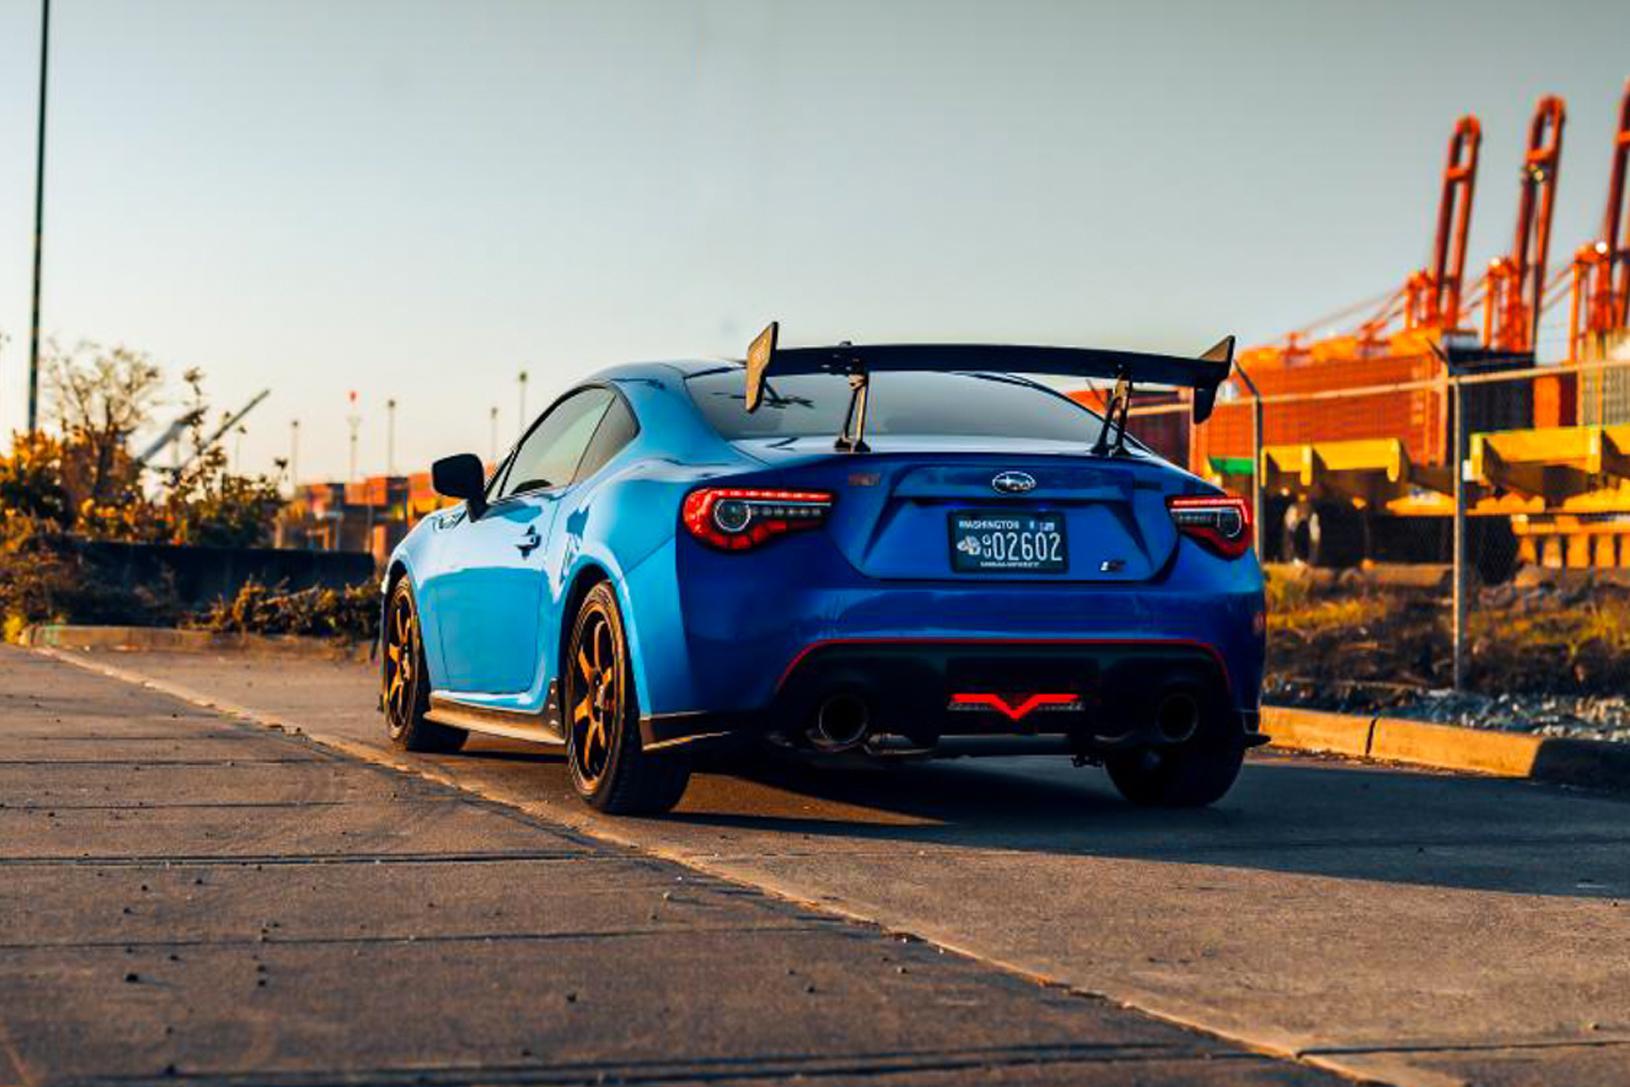 2018 Subaru BRZ tS 'Supercharged'